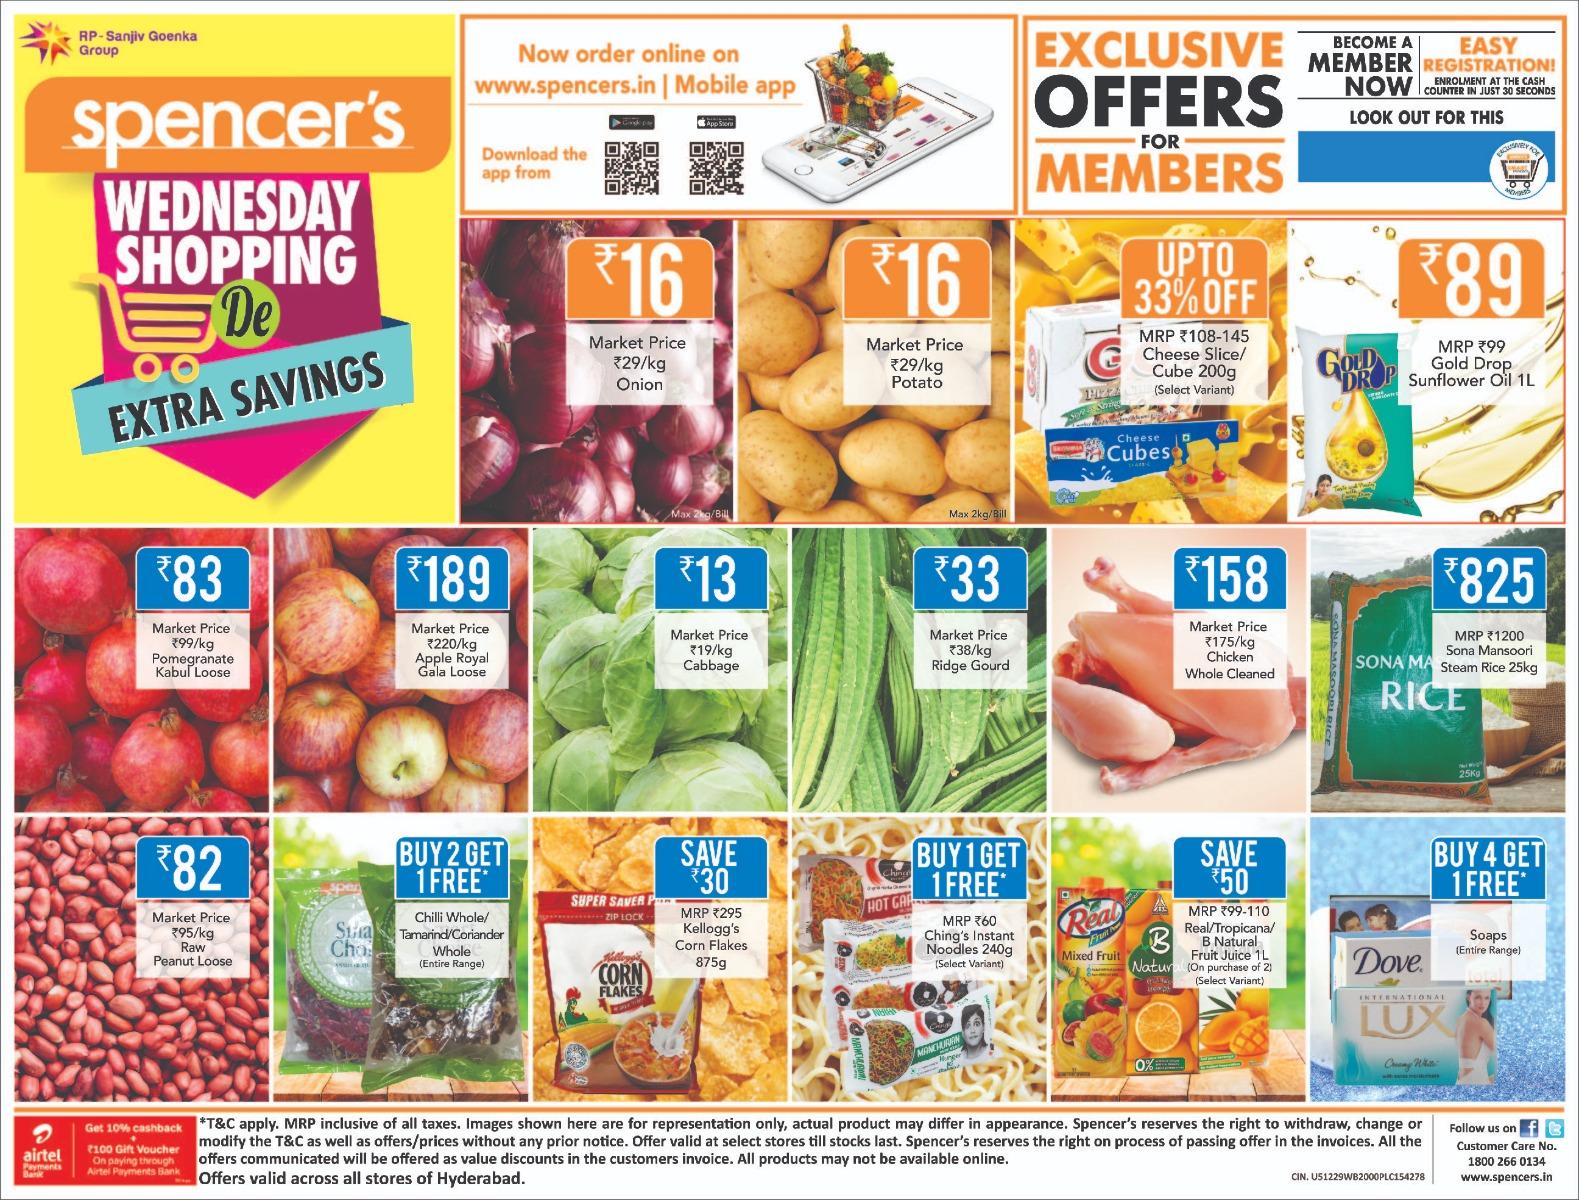 Spencer's Wednesday Shopping Extra Savings